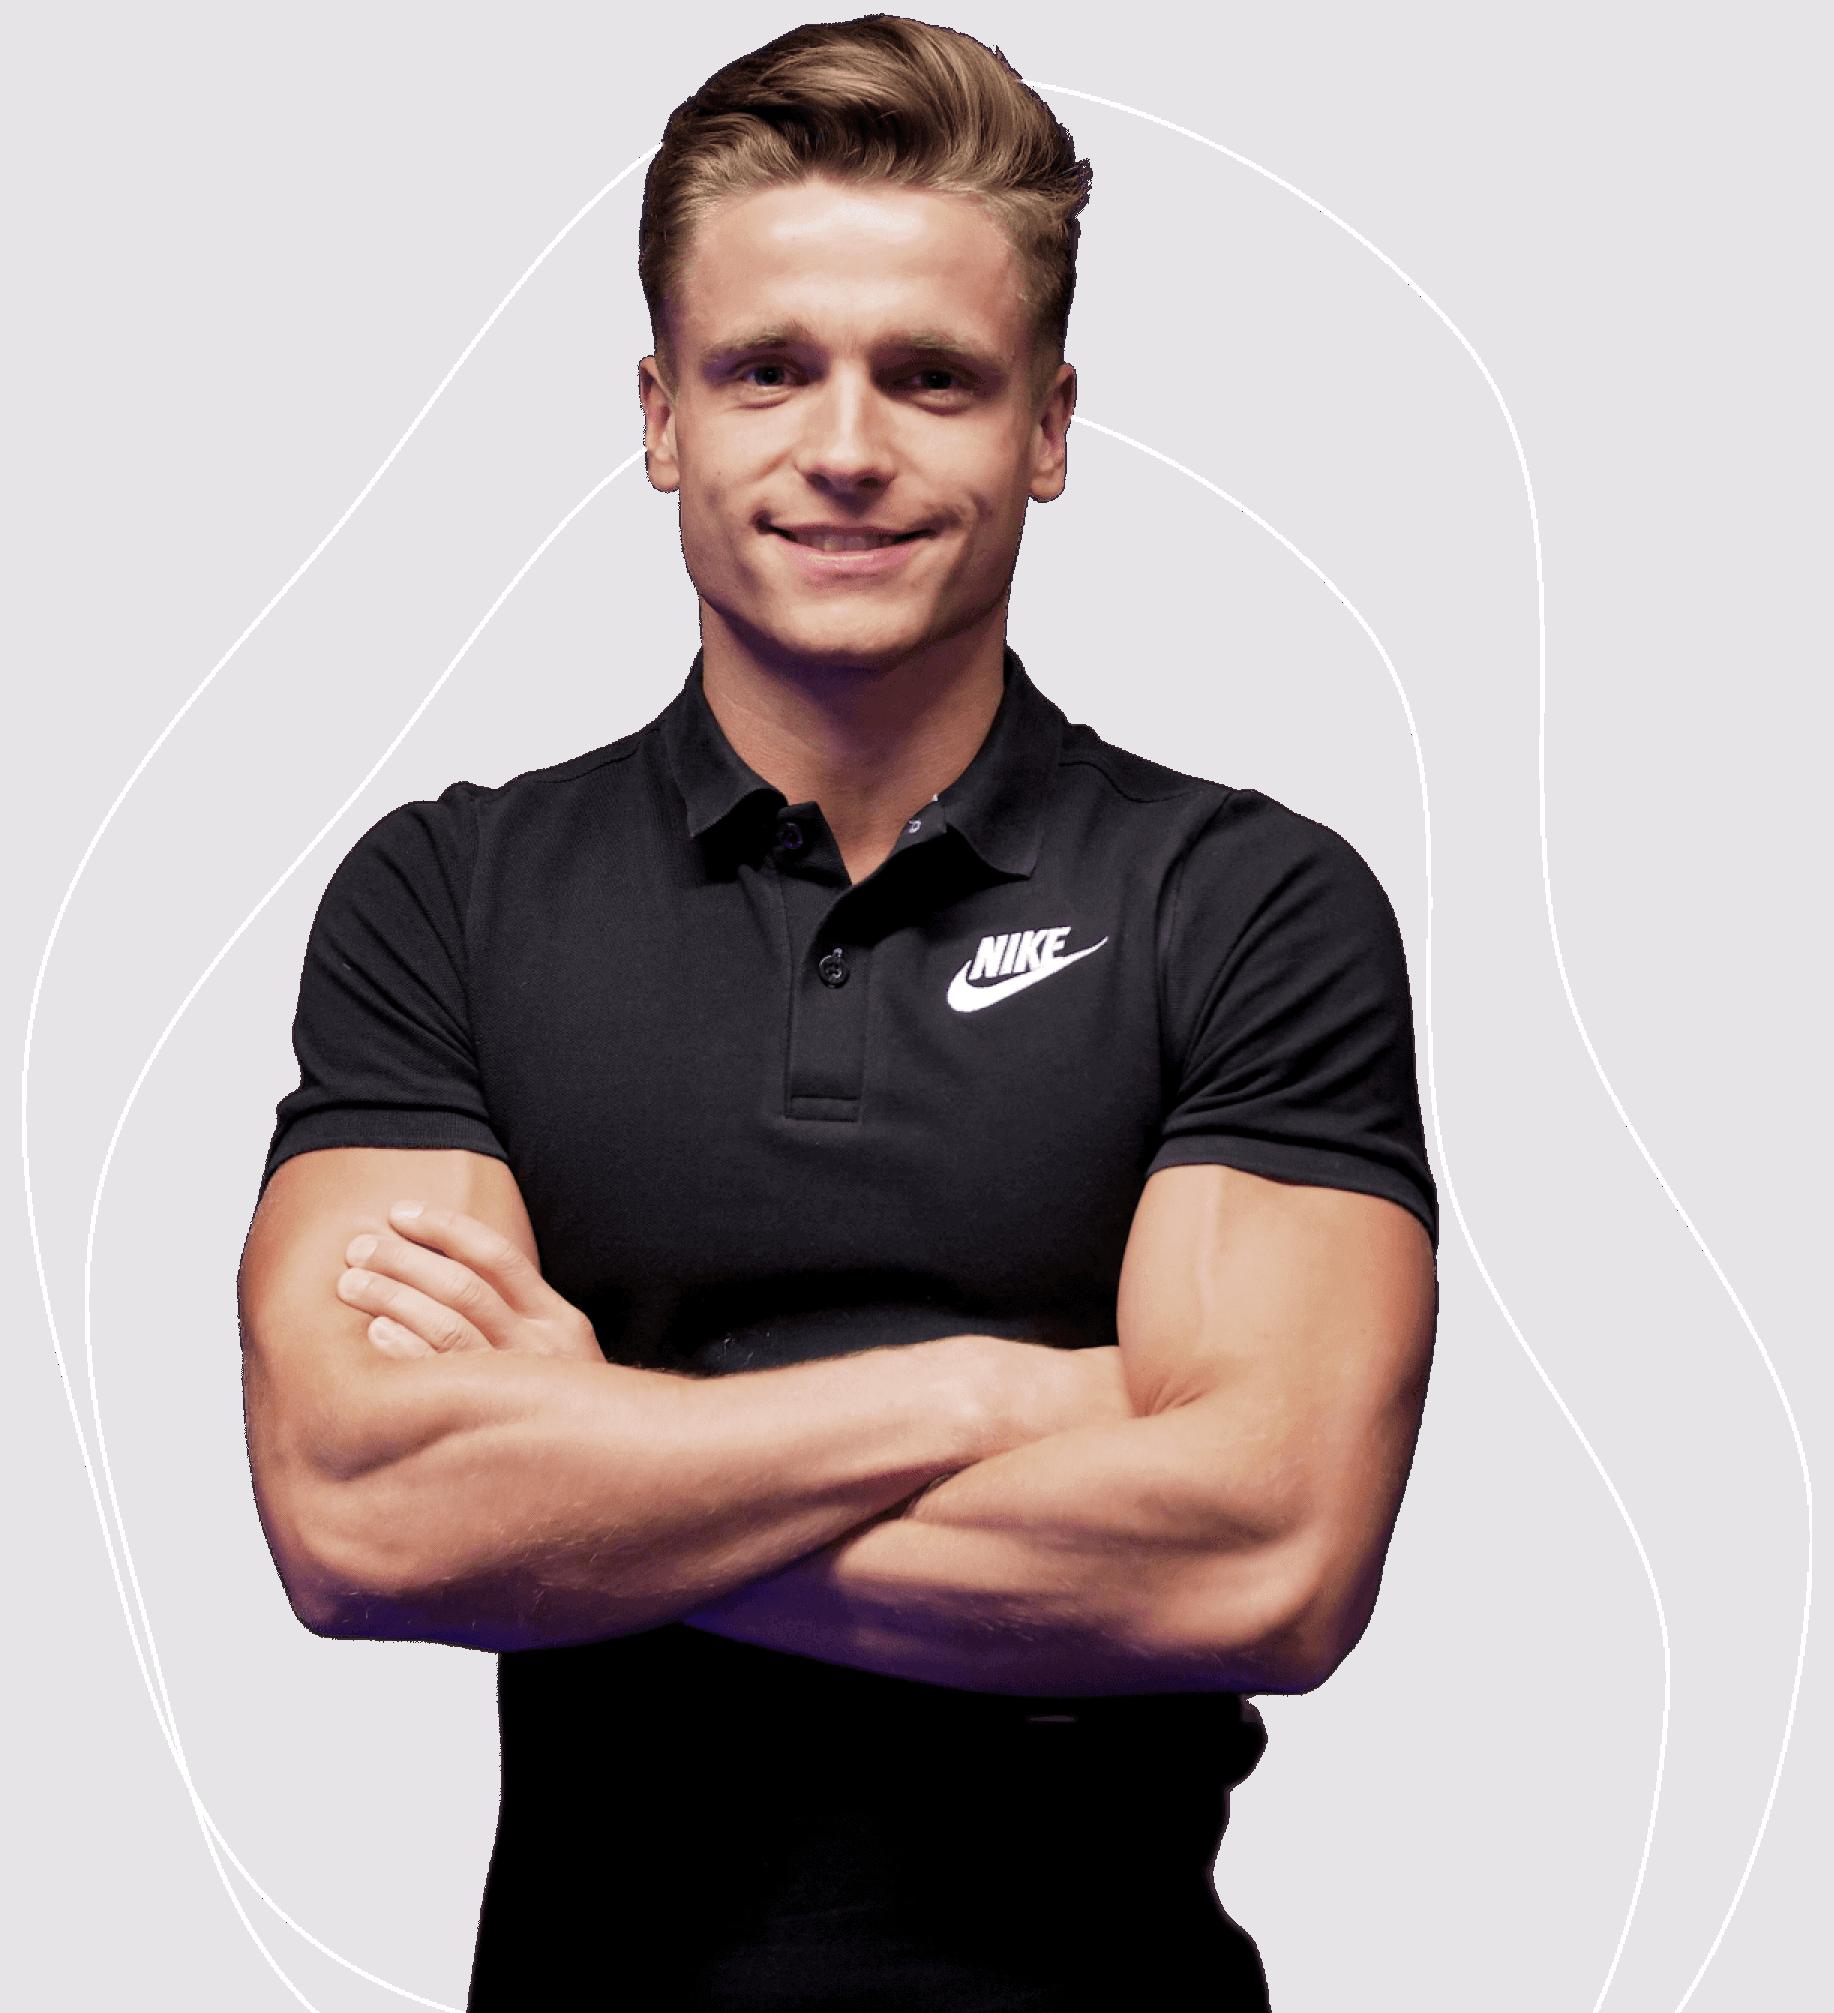 Sebastian Personal Trainer Edinburgh